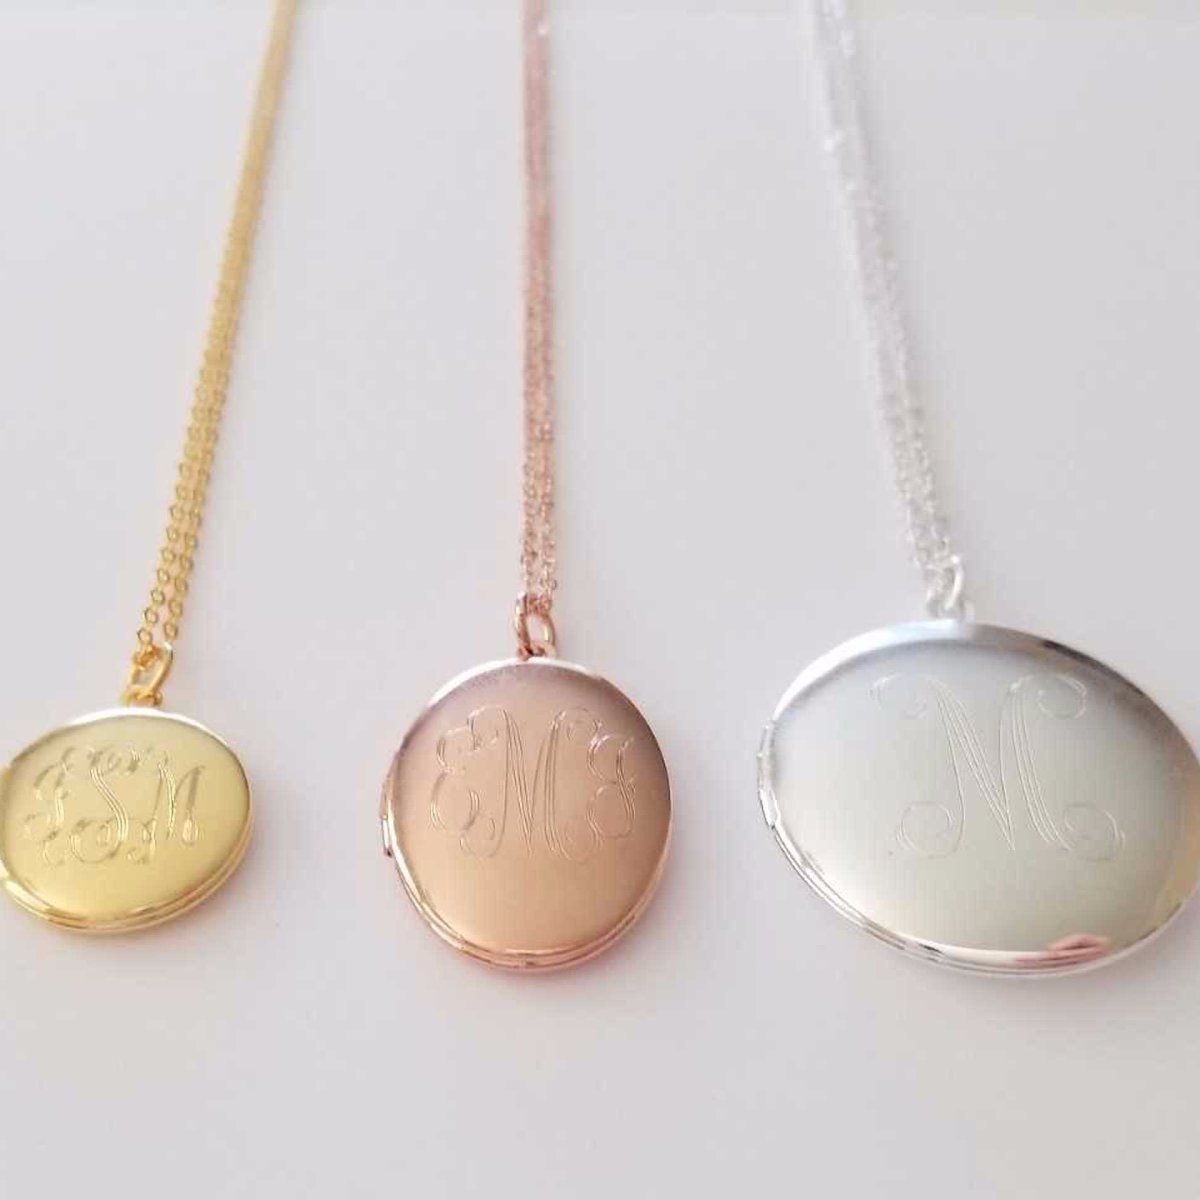 900b5e47a7ac Collar De Medallón · Medallones · A wonderful classic piece to treasure  forever. Our engraved monogram locket is versatile enough to